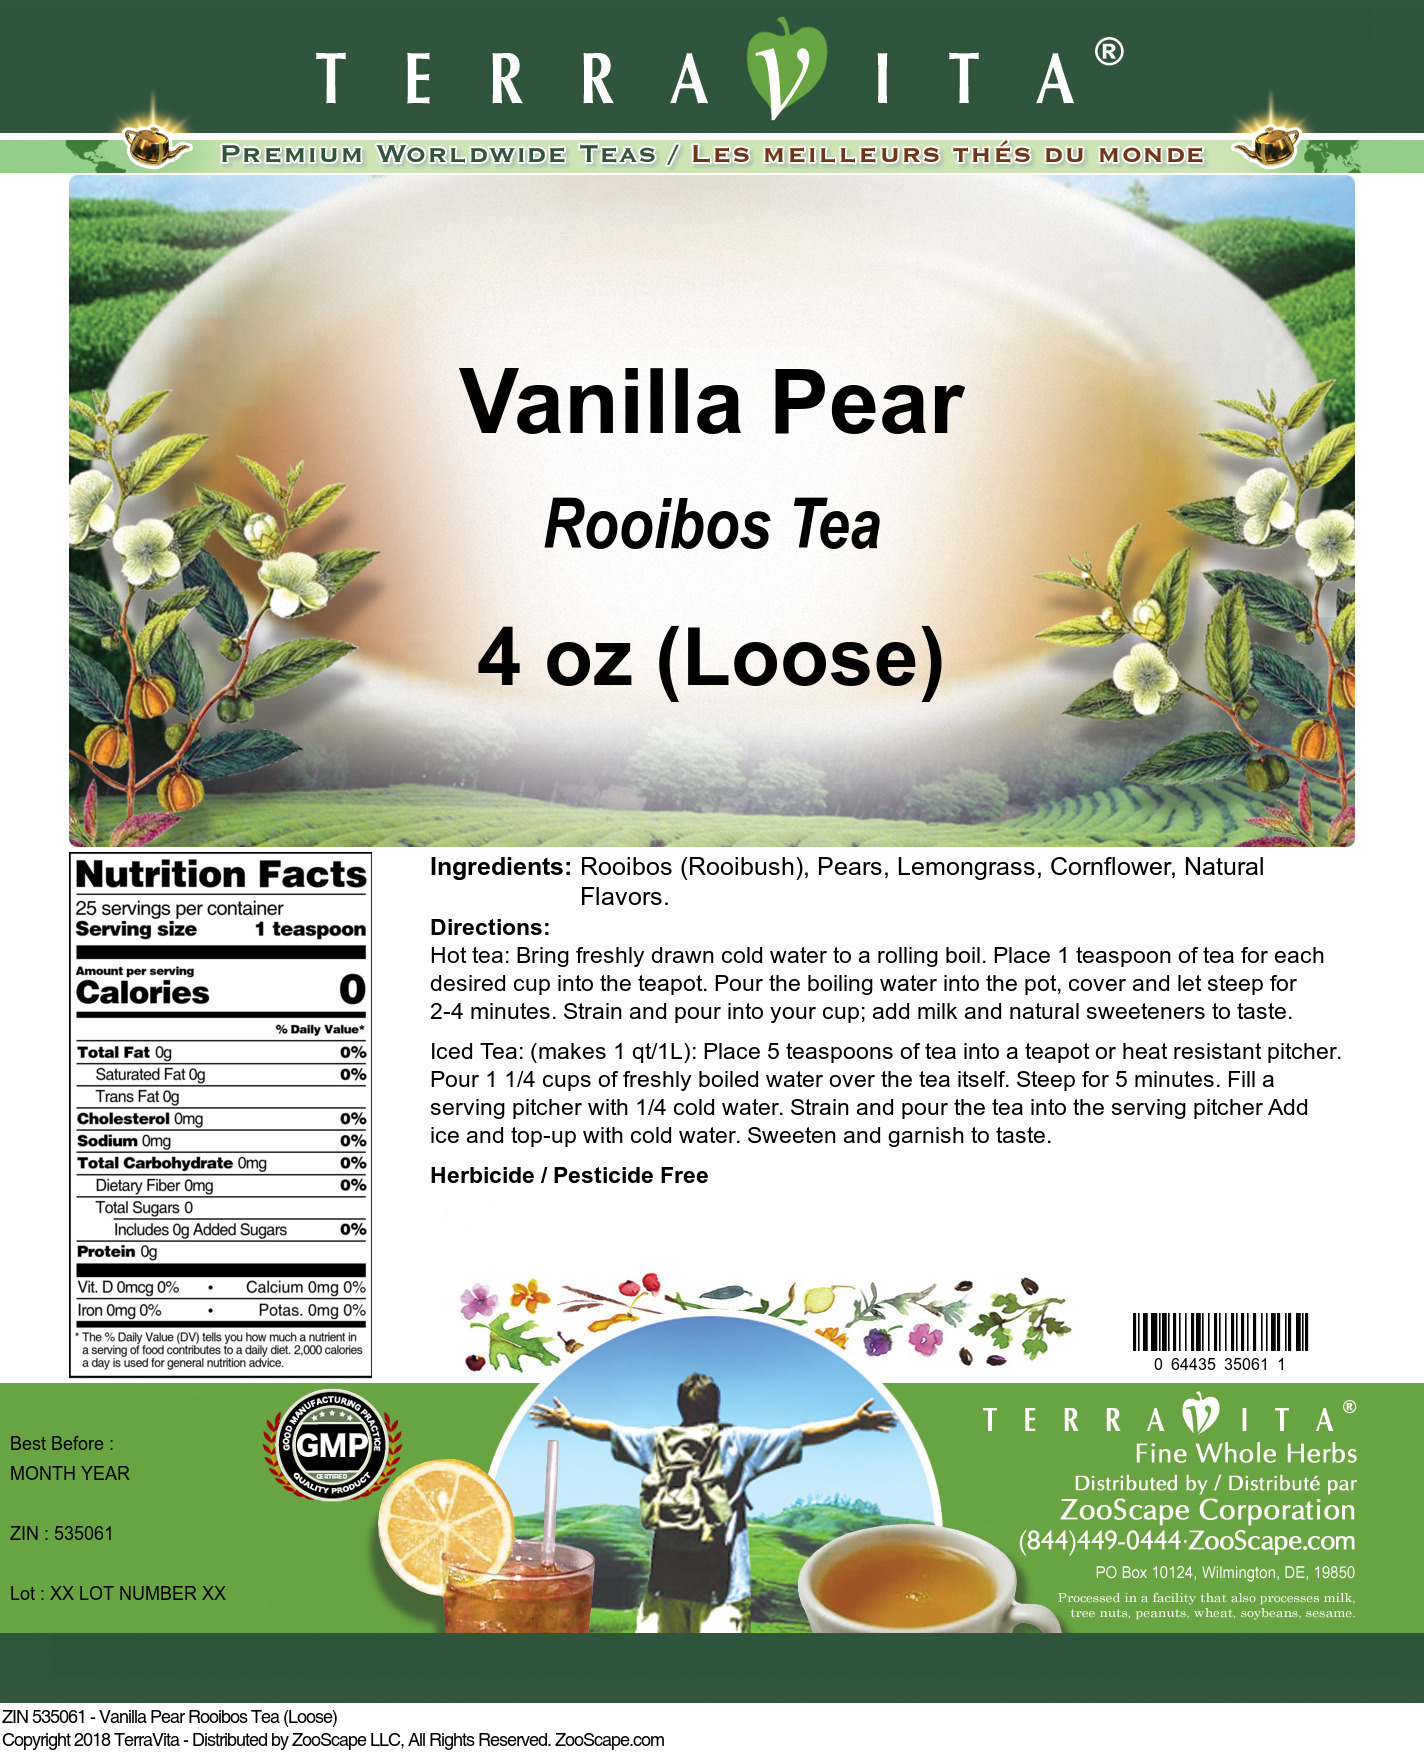 Vanilla Pear Rooibos Tea (Loose)